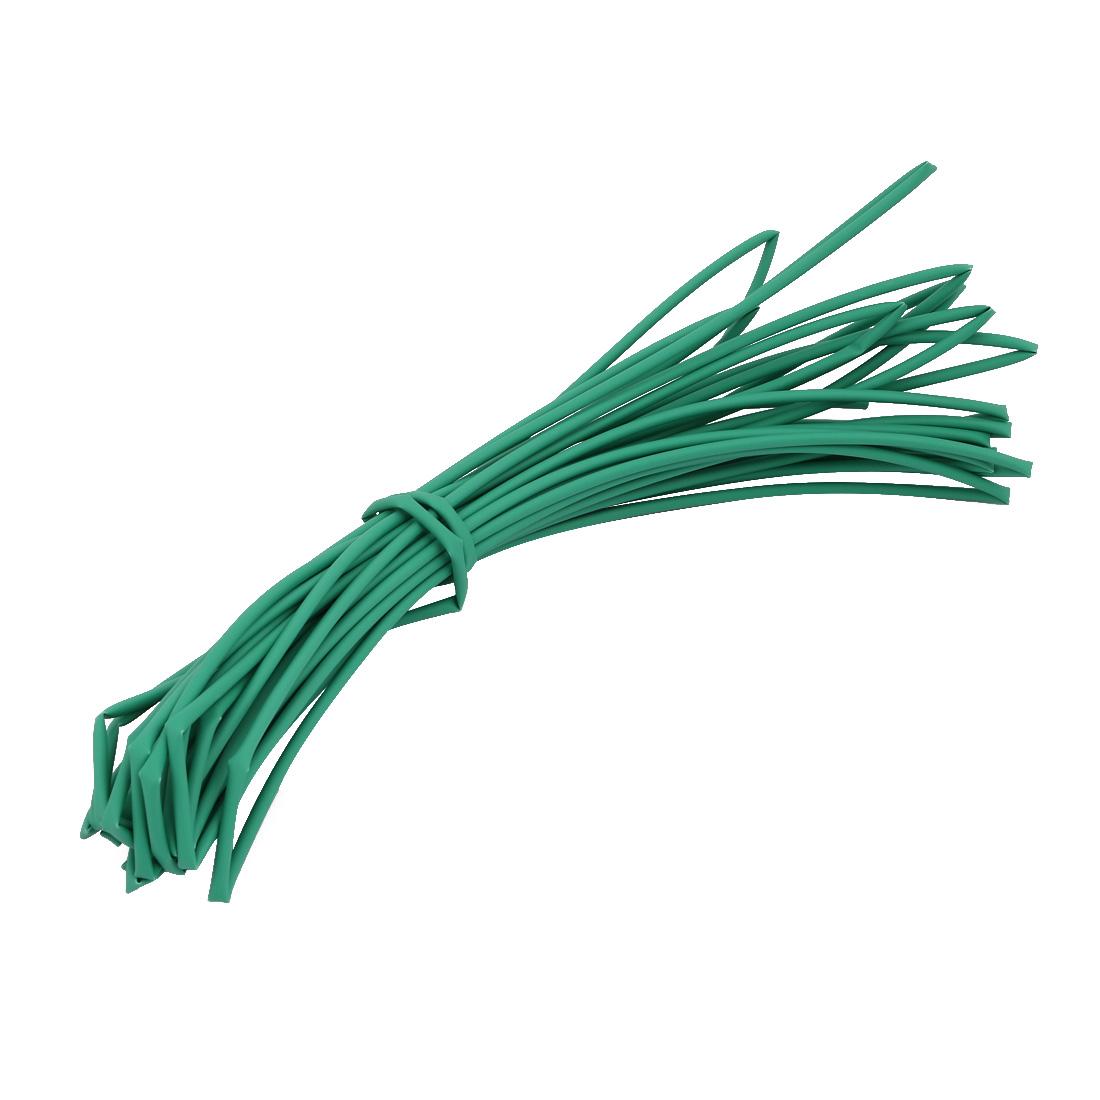 8M 0.08in Inner Dia Polyolefin Flame Retardant Tube Green for Wire Repairing